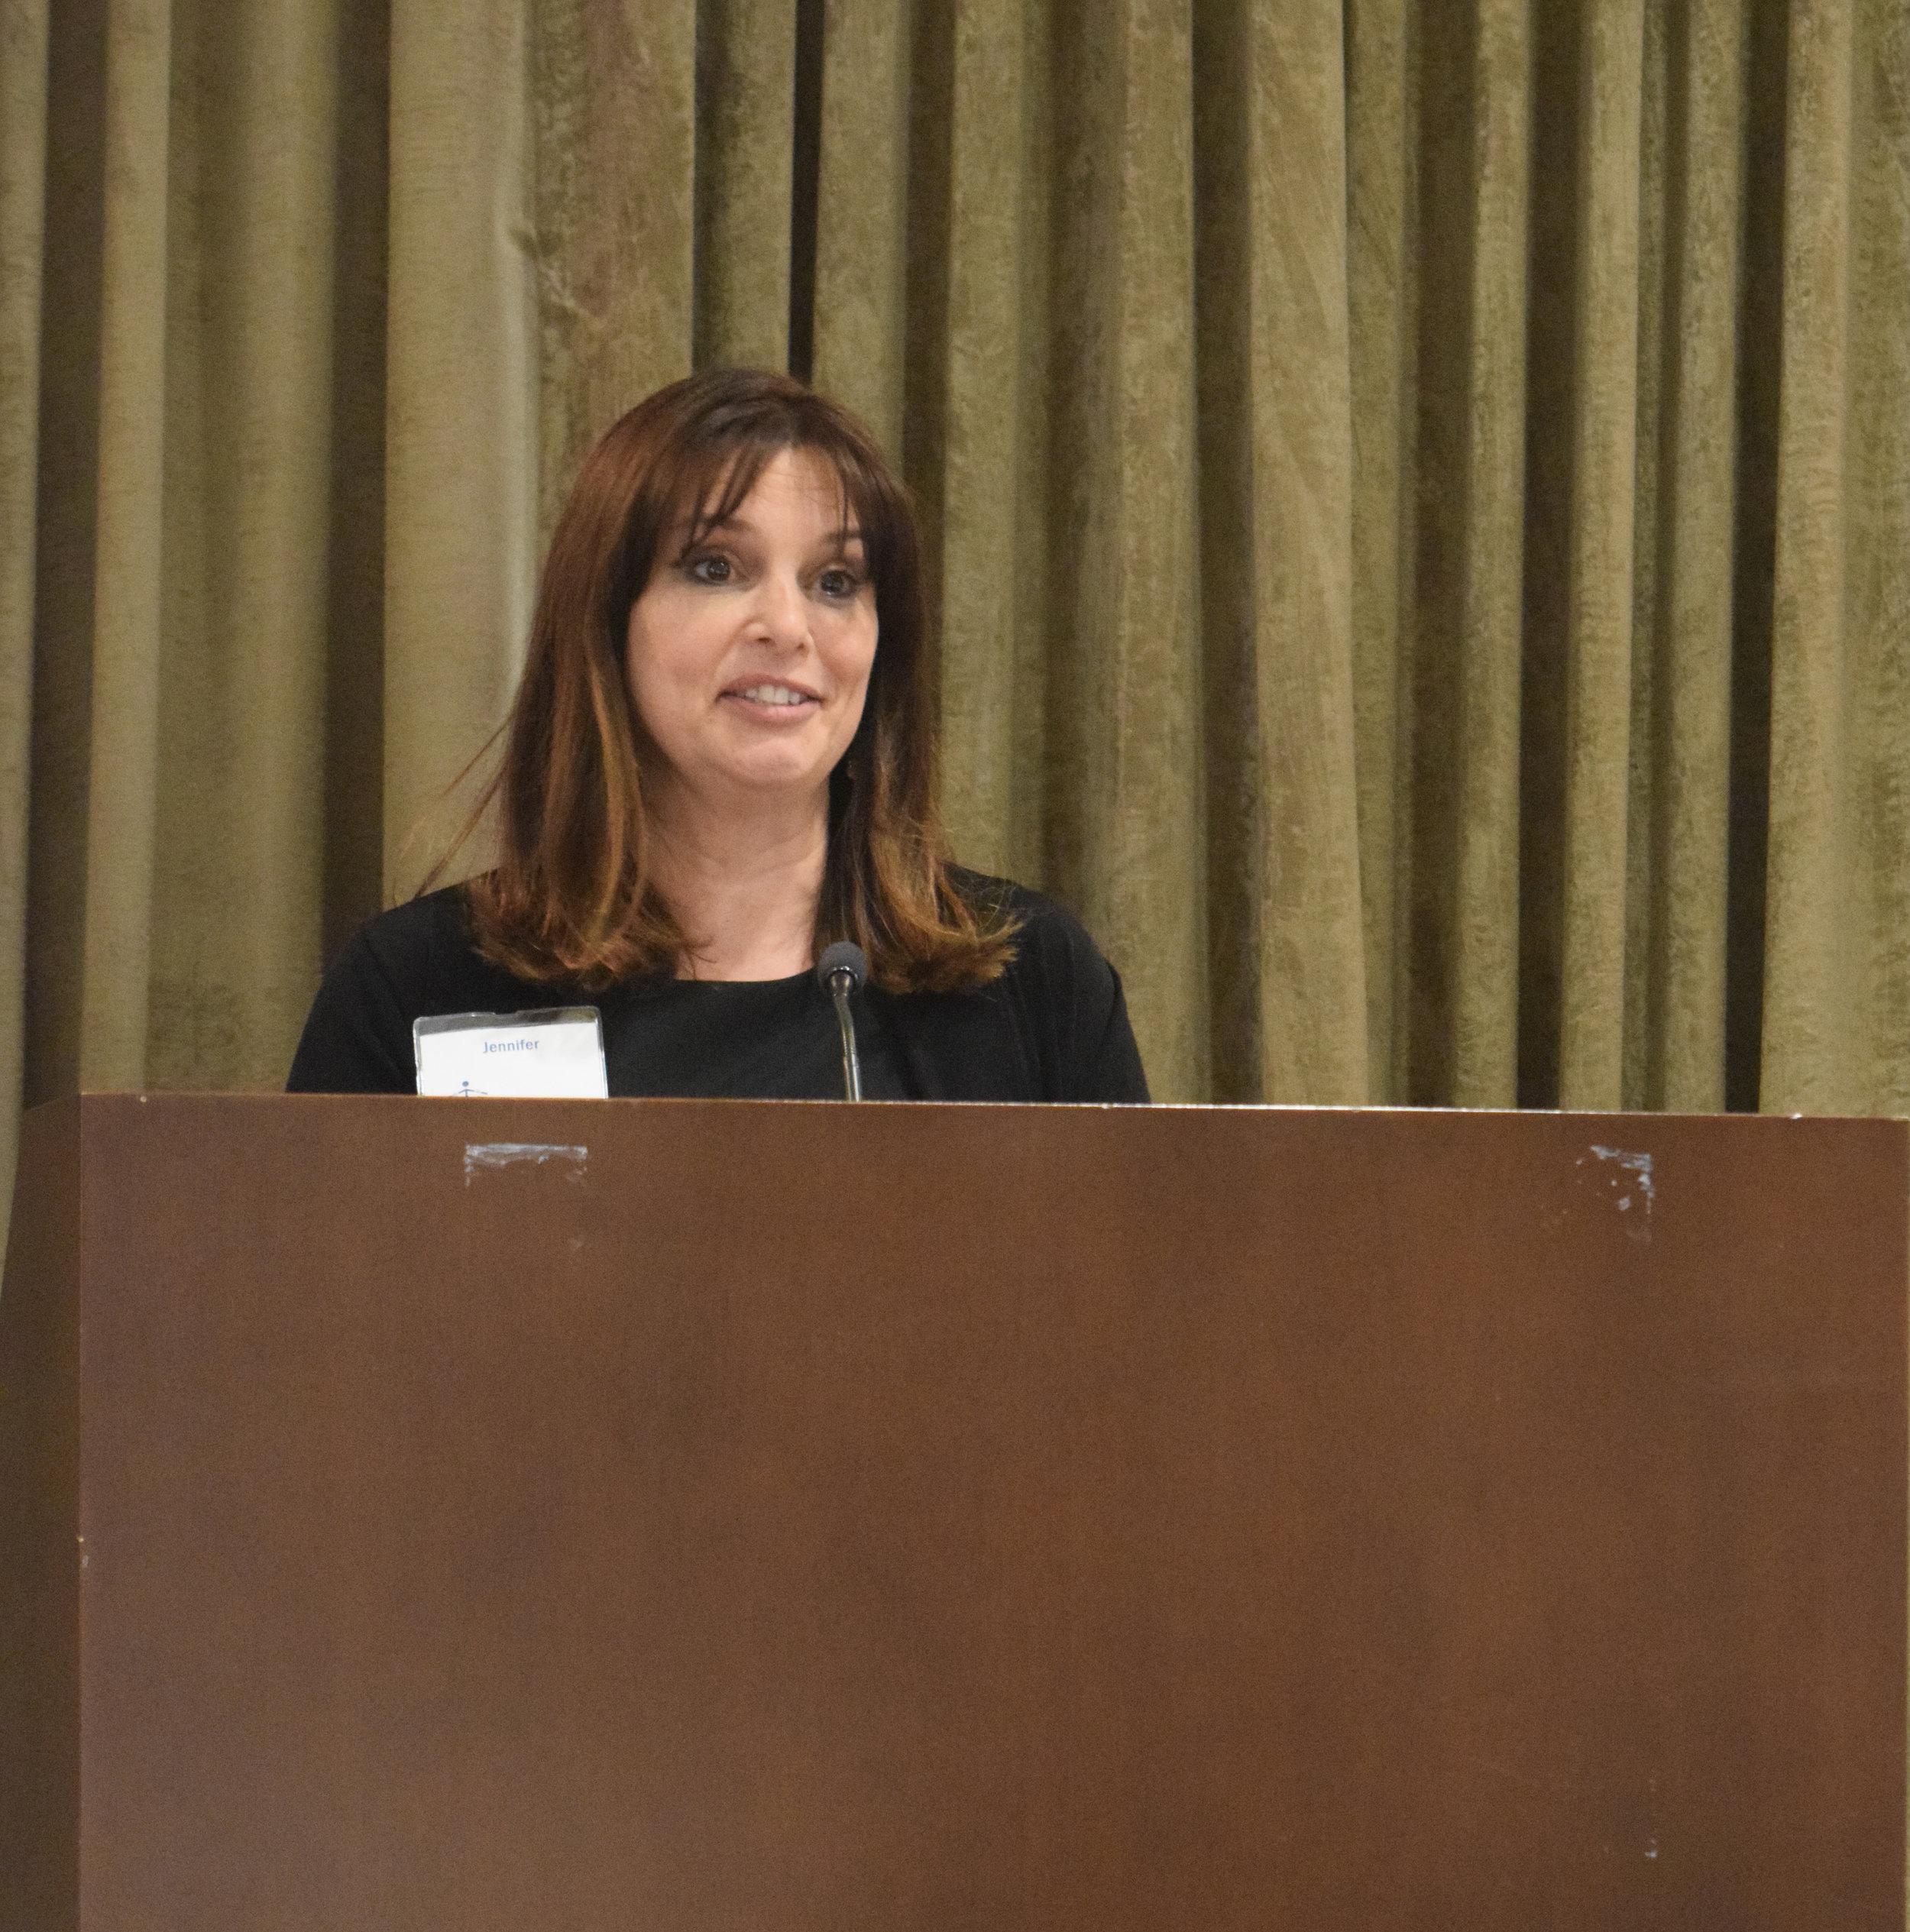 Jennifer shares her story at the Celebration Event.